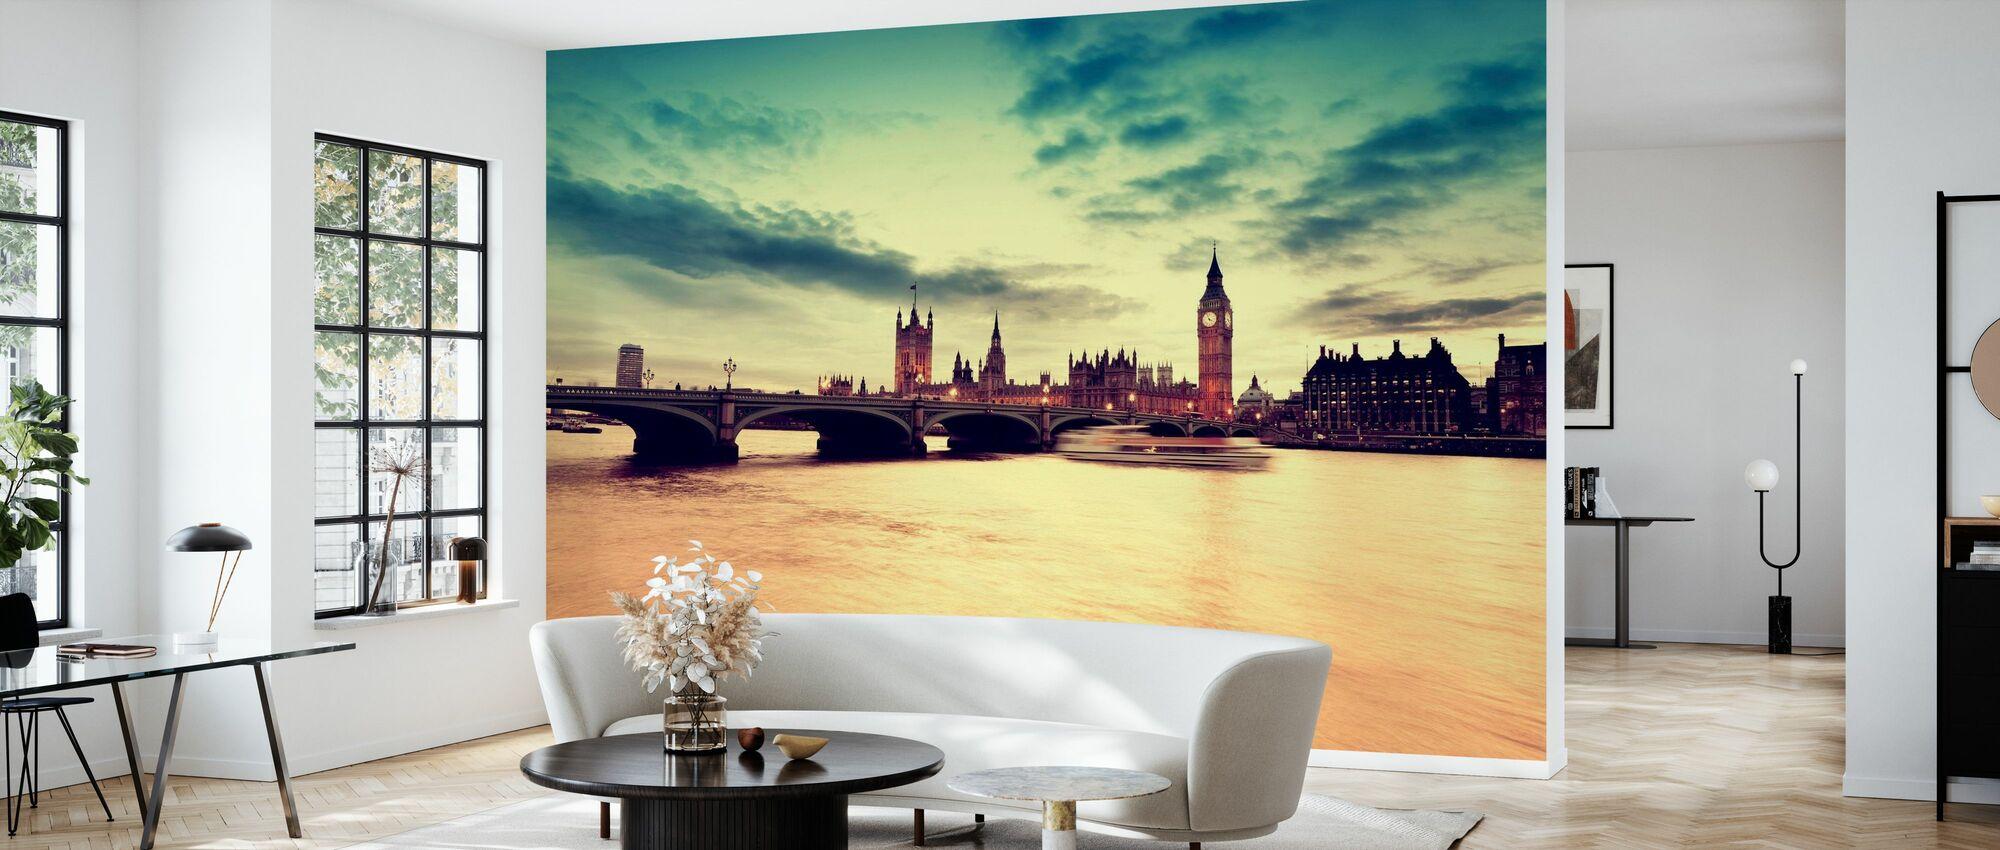 London Golden Evening - Tapet - Stue